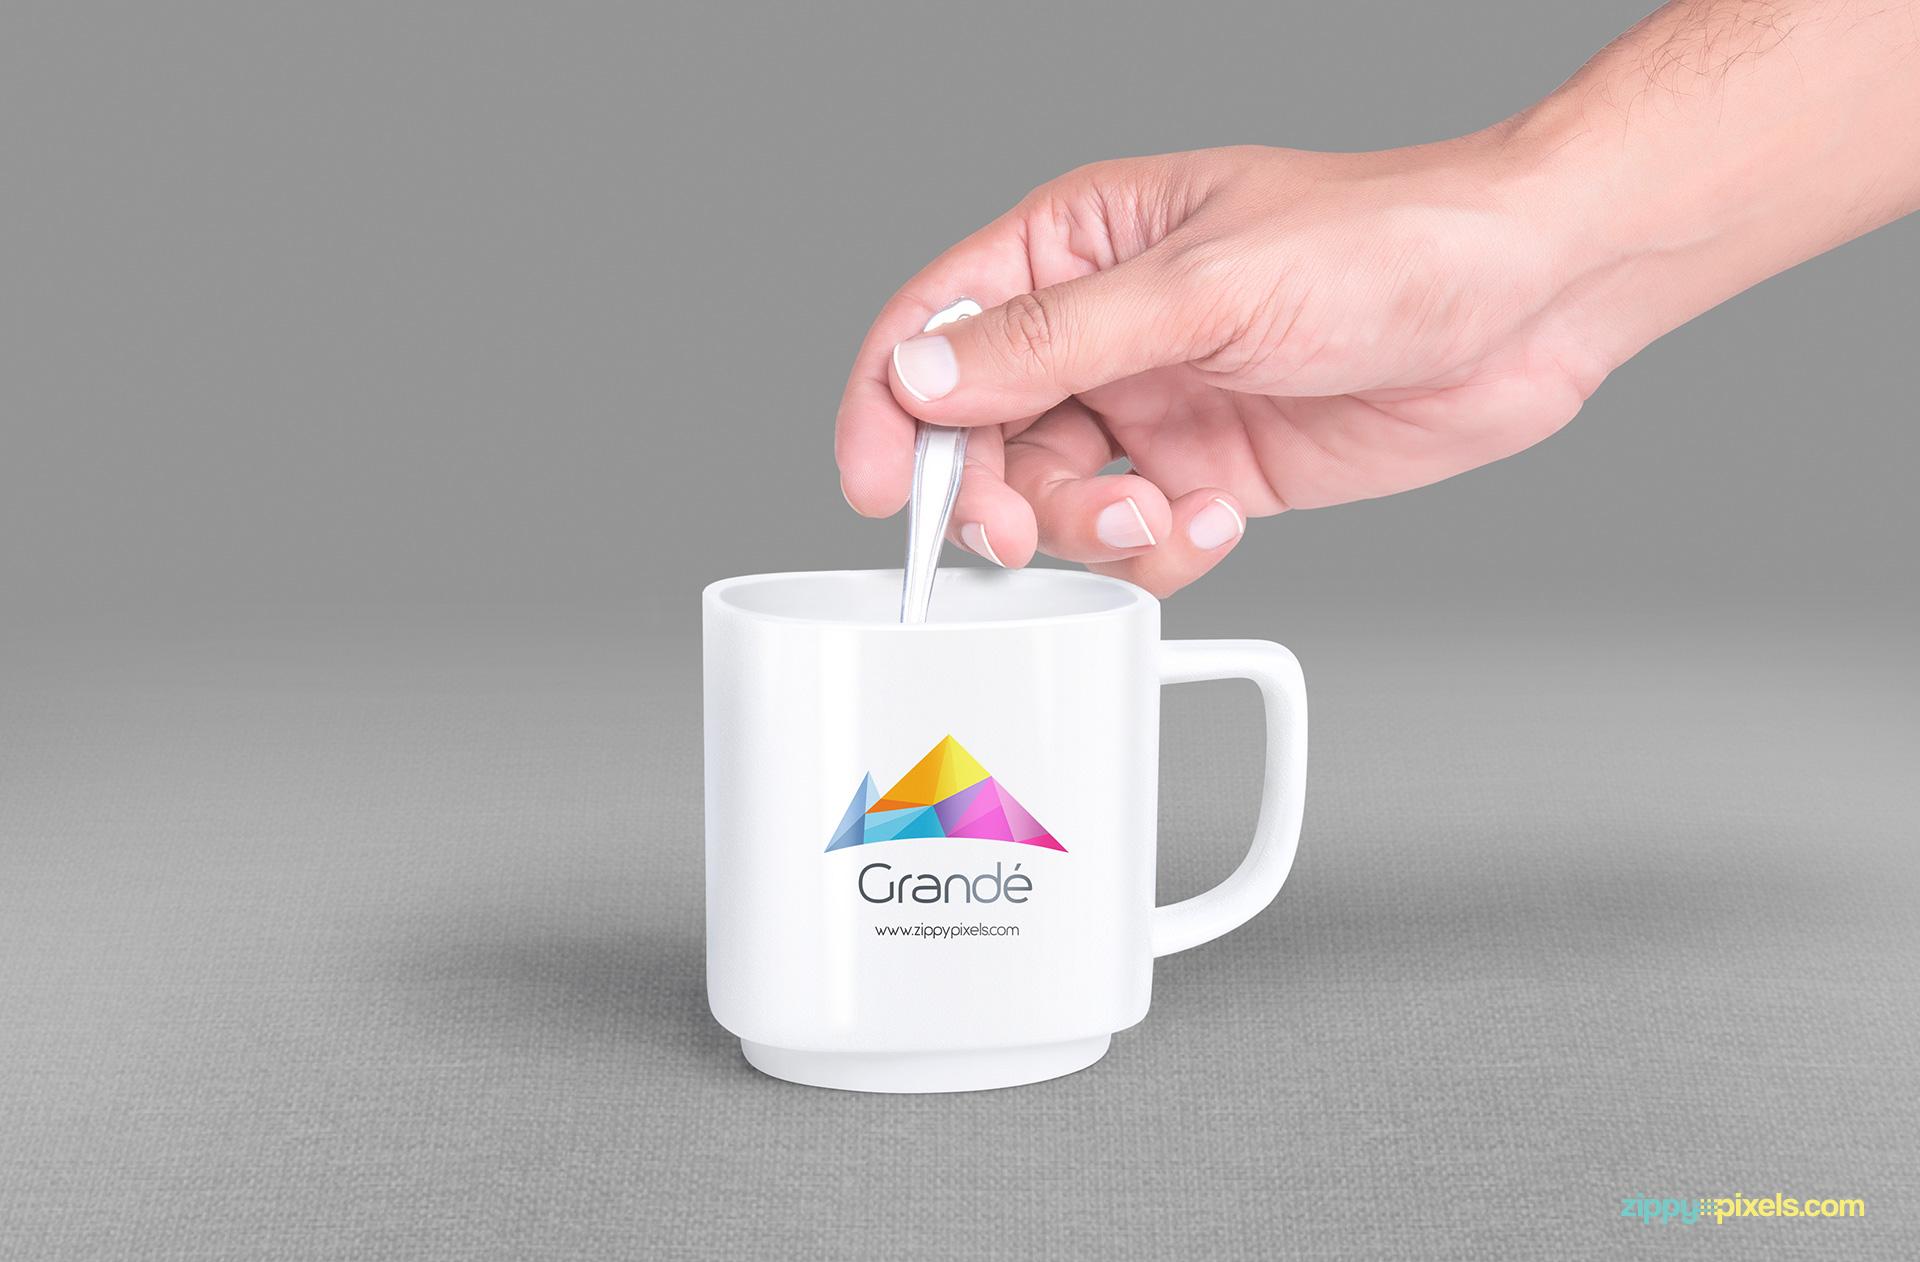 Easy to use free psd mug mockup.